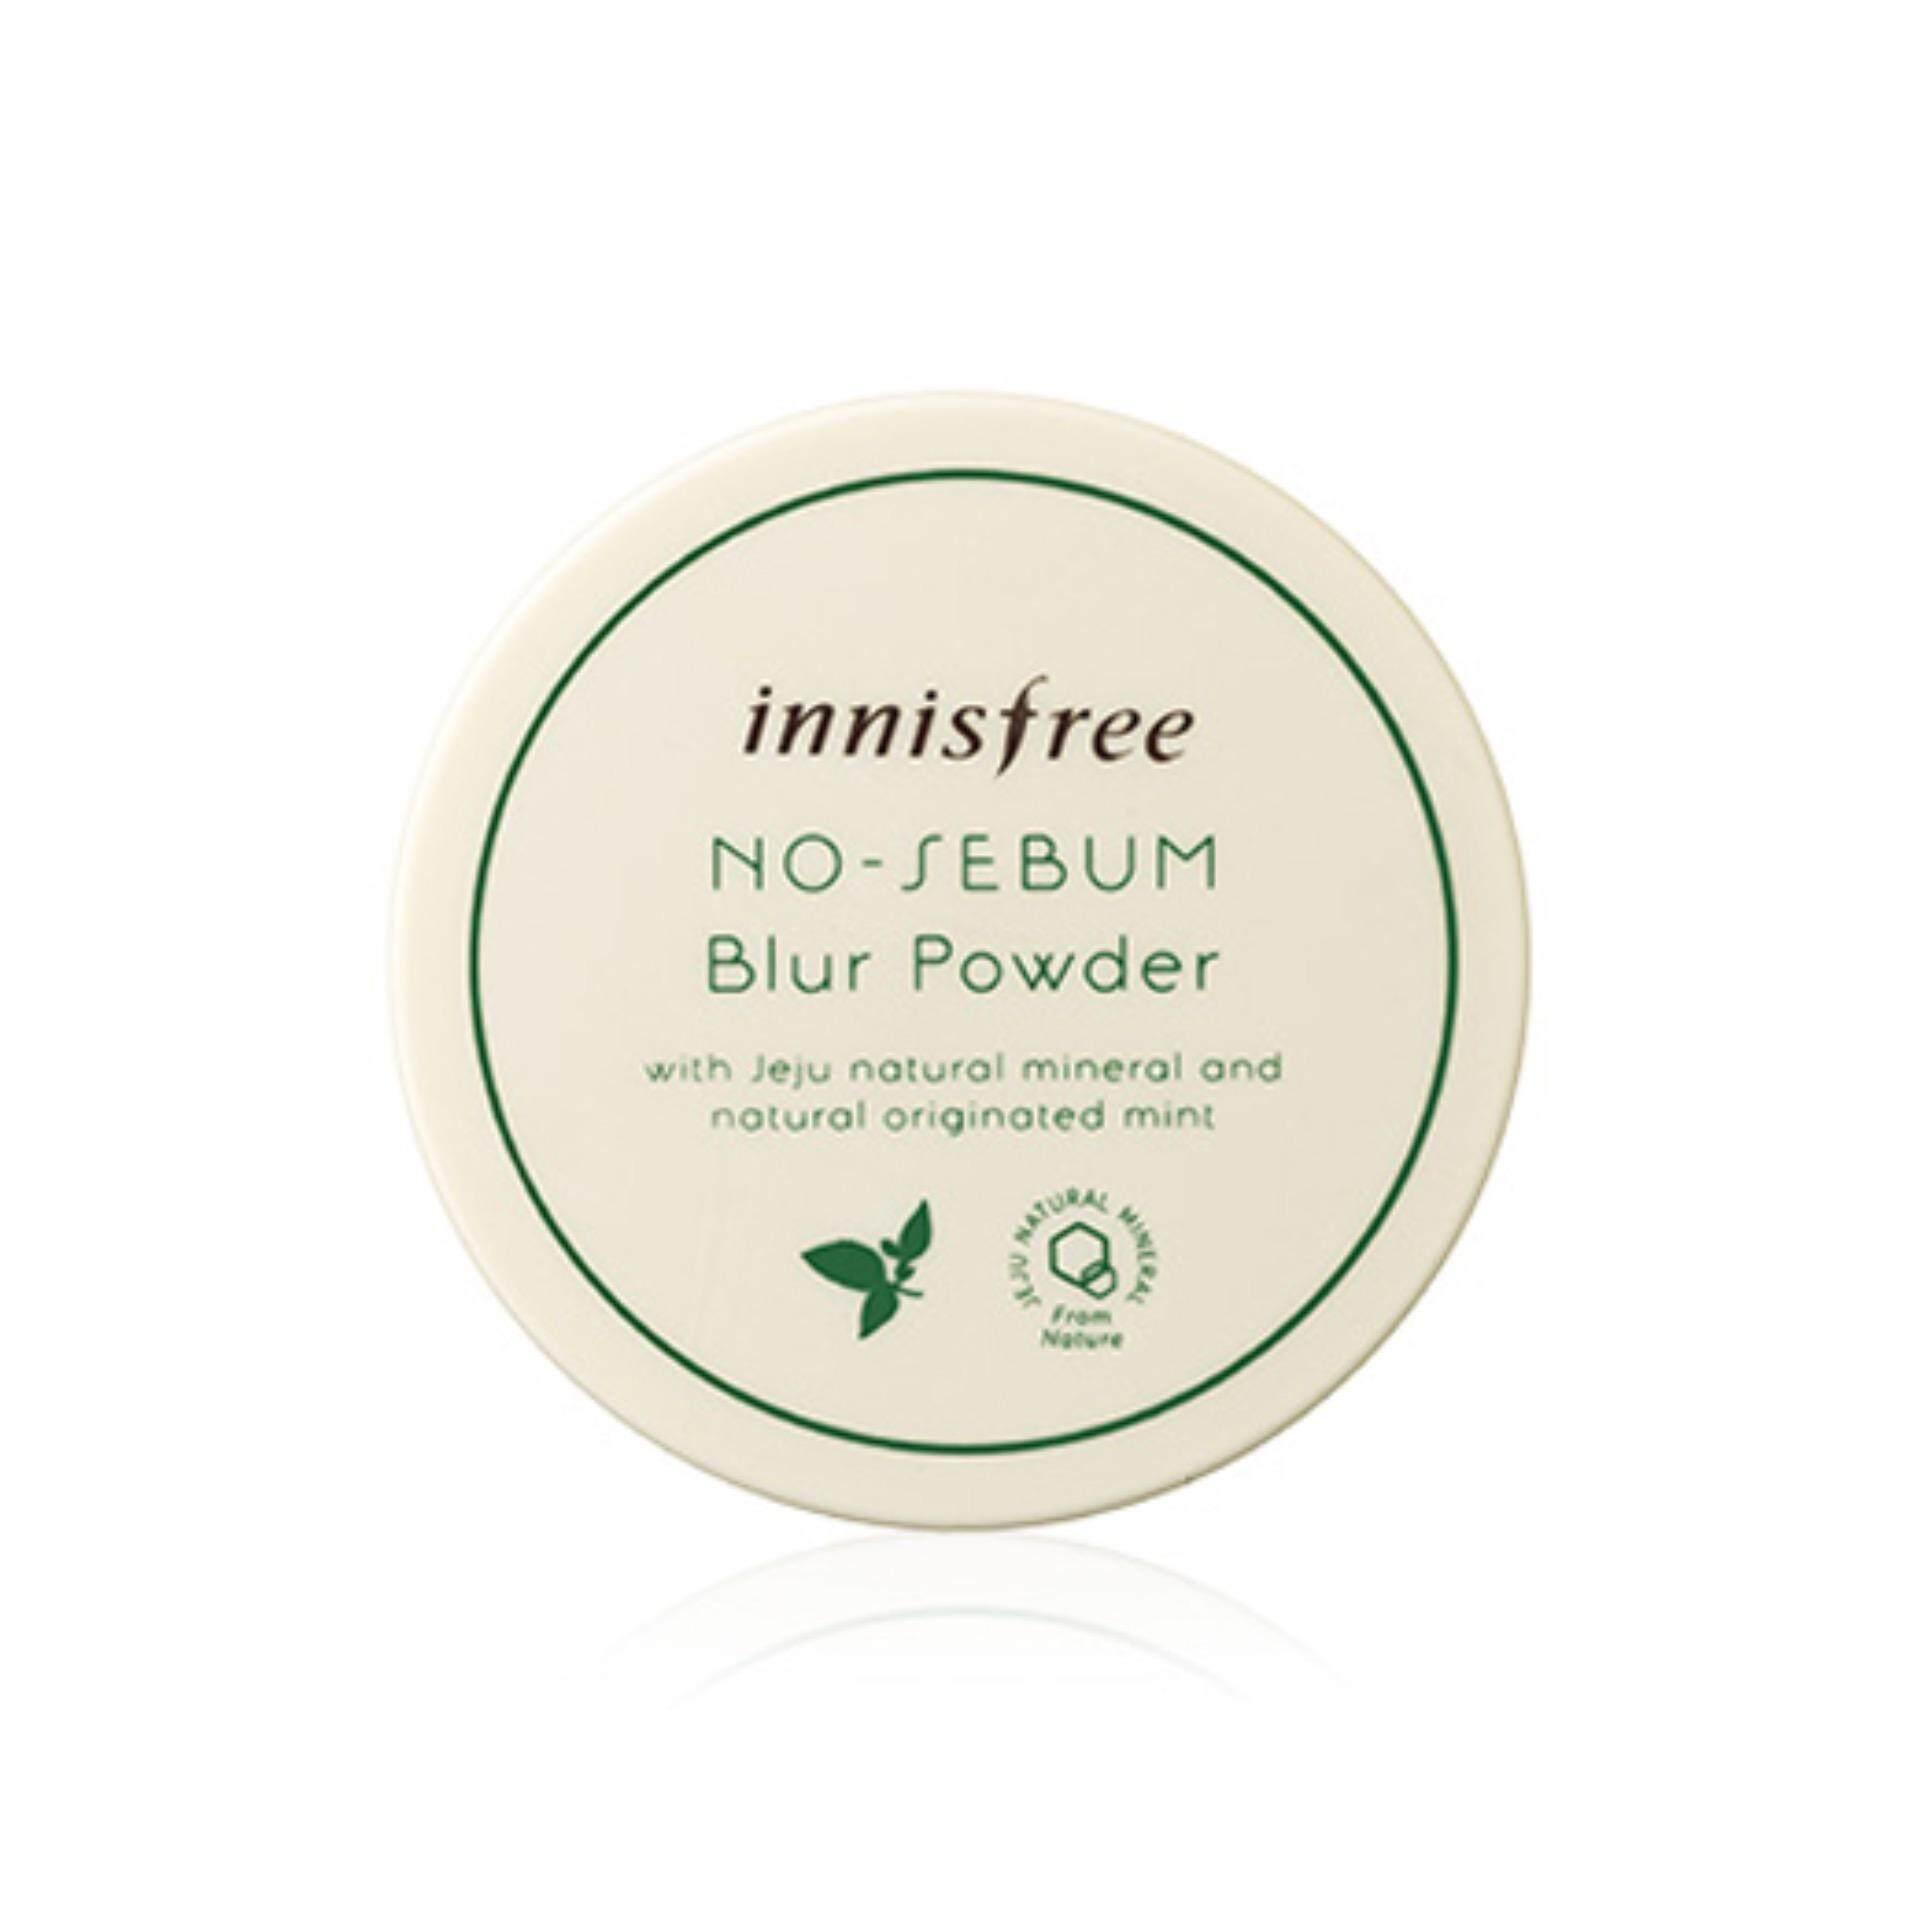 Innisfree No-Sebum Blur Powder (tinted)